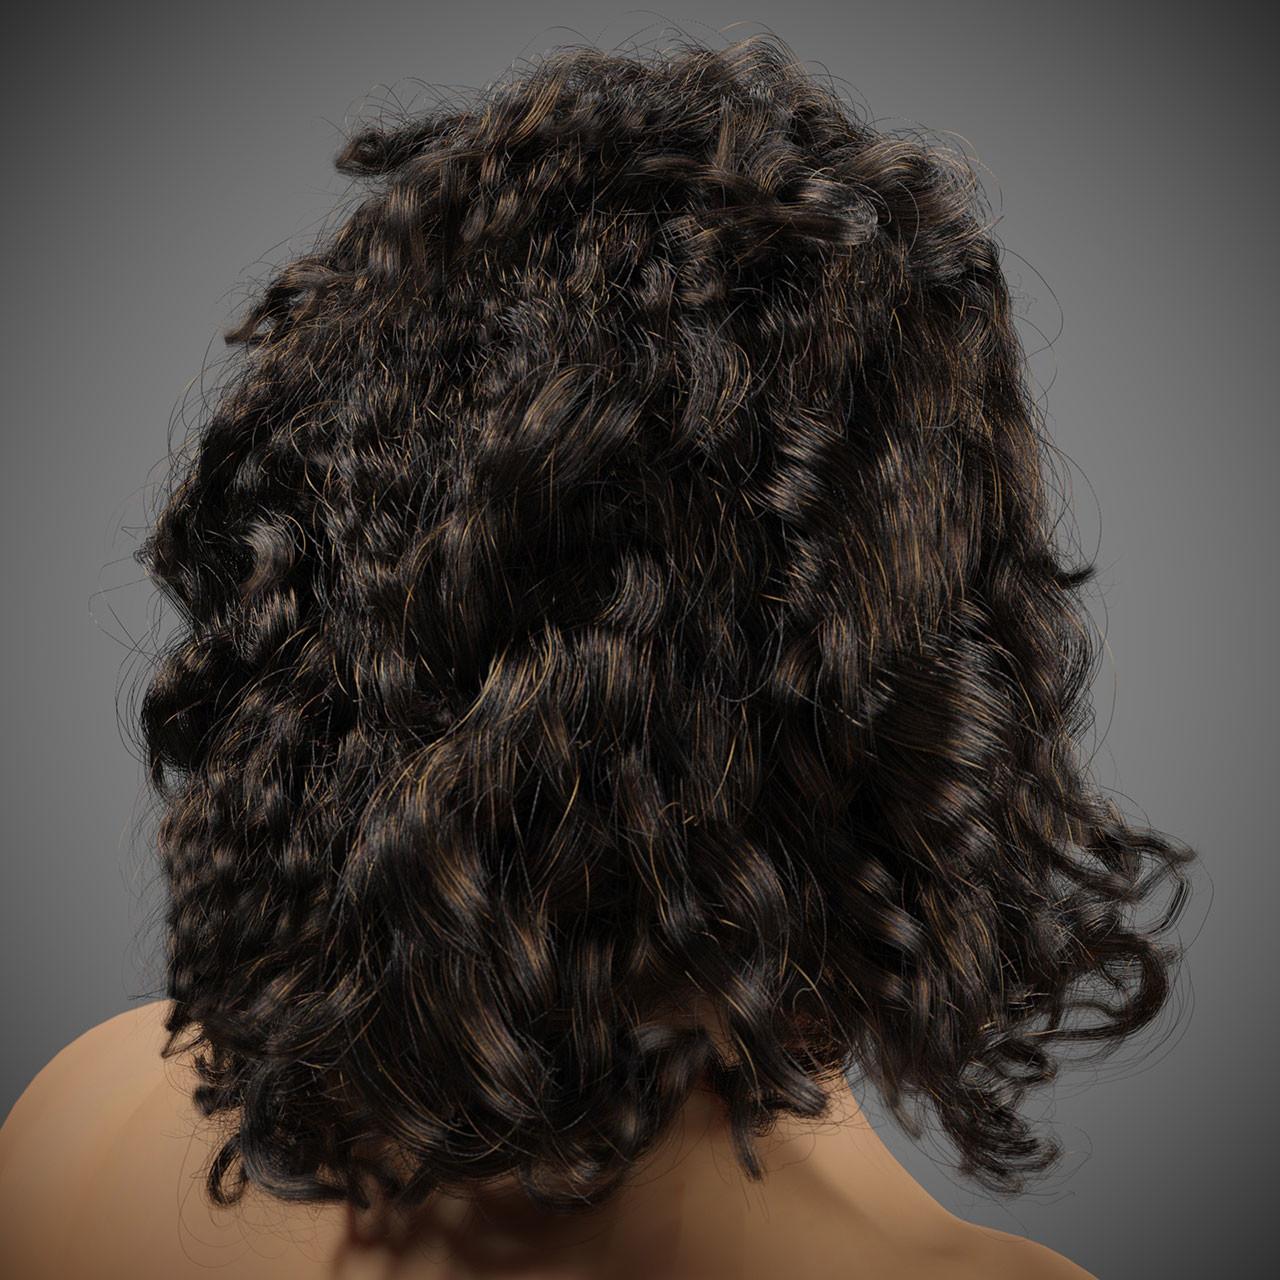 Andrew krivulya joseph hairstyle 1 r 09 by andrew krivulya